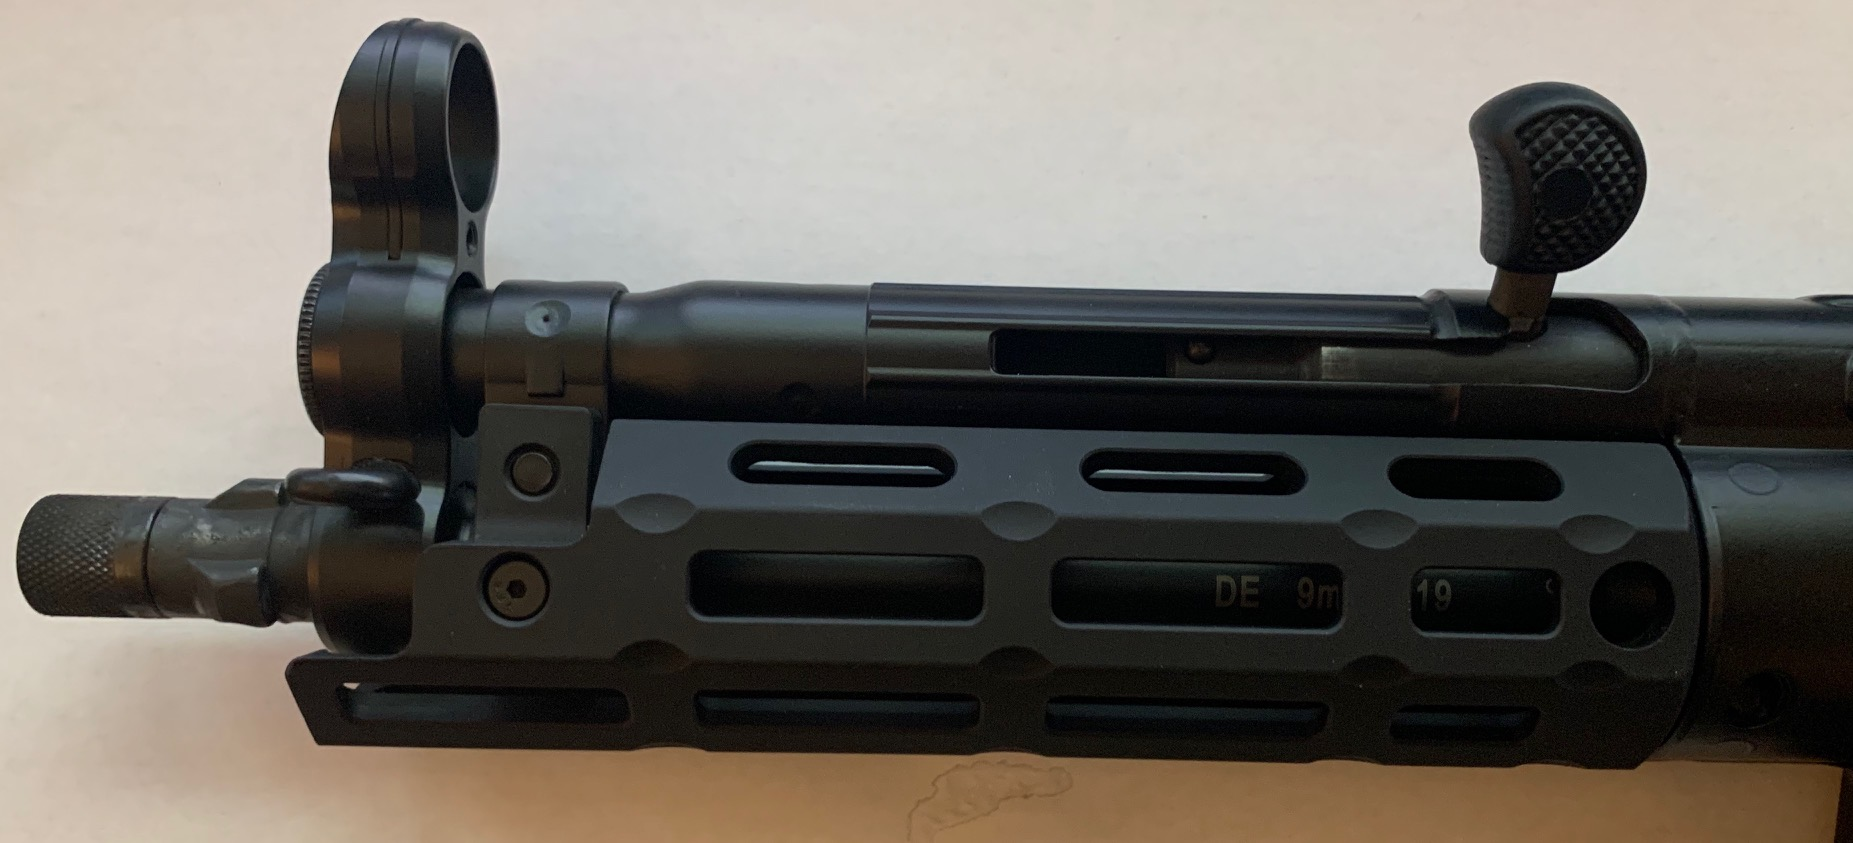 EDIT with Photos: Review of A3 Tactical Vert Grip on MI M-LOK MP5 Handguard-img_3837.jpg